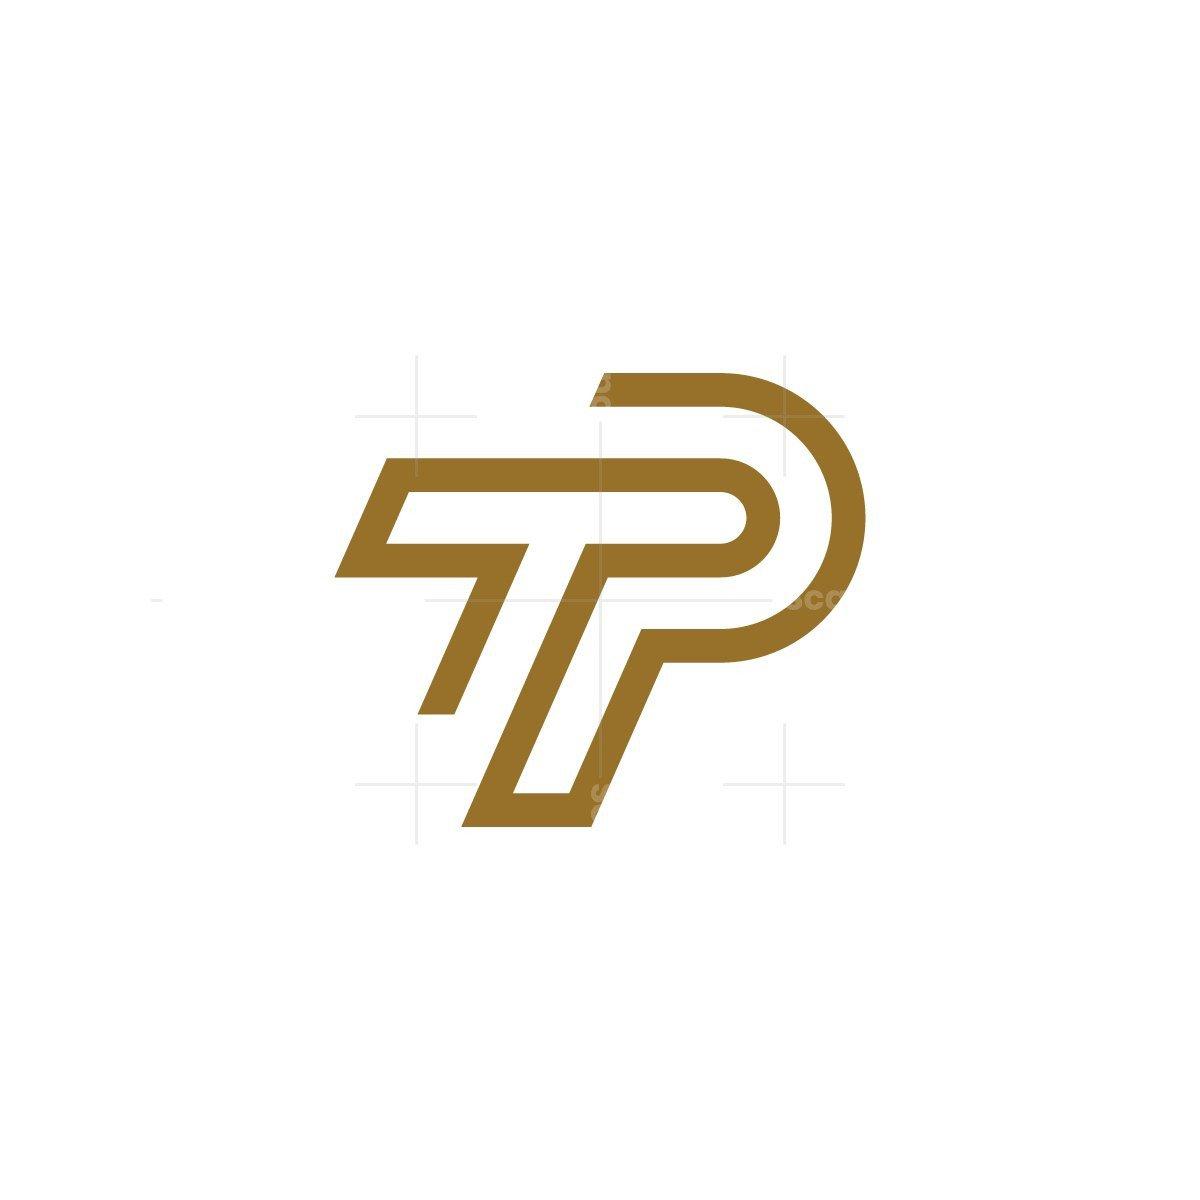 Stylish Letter Tp Logo